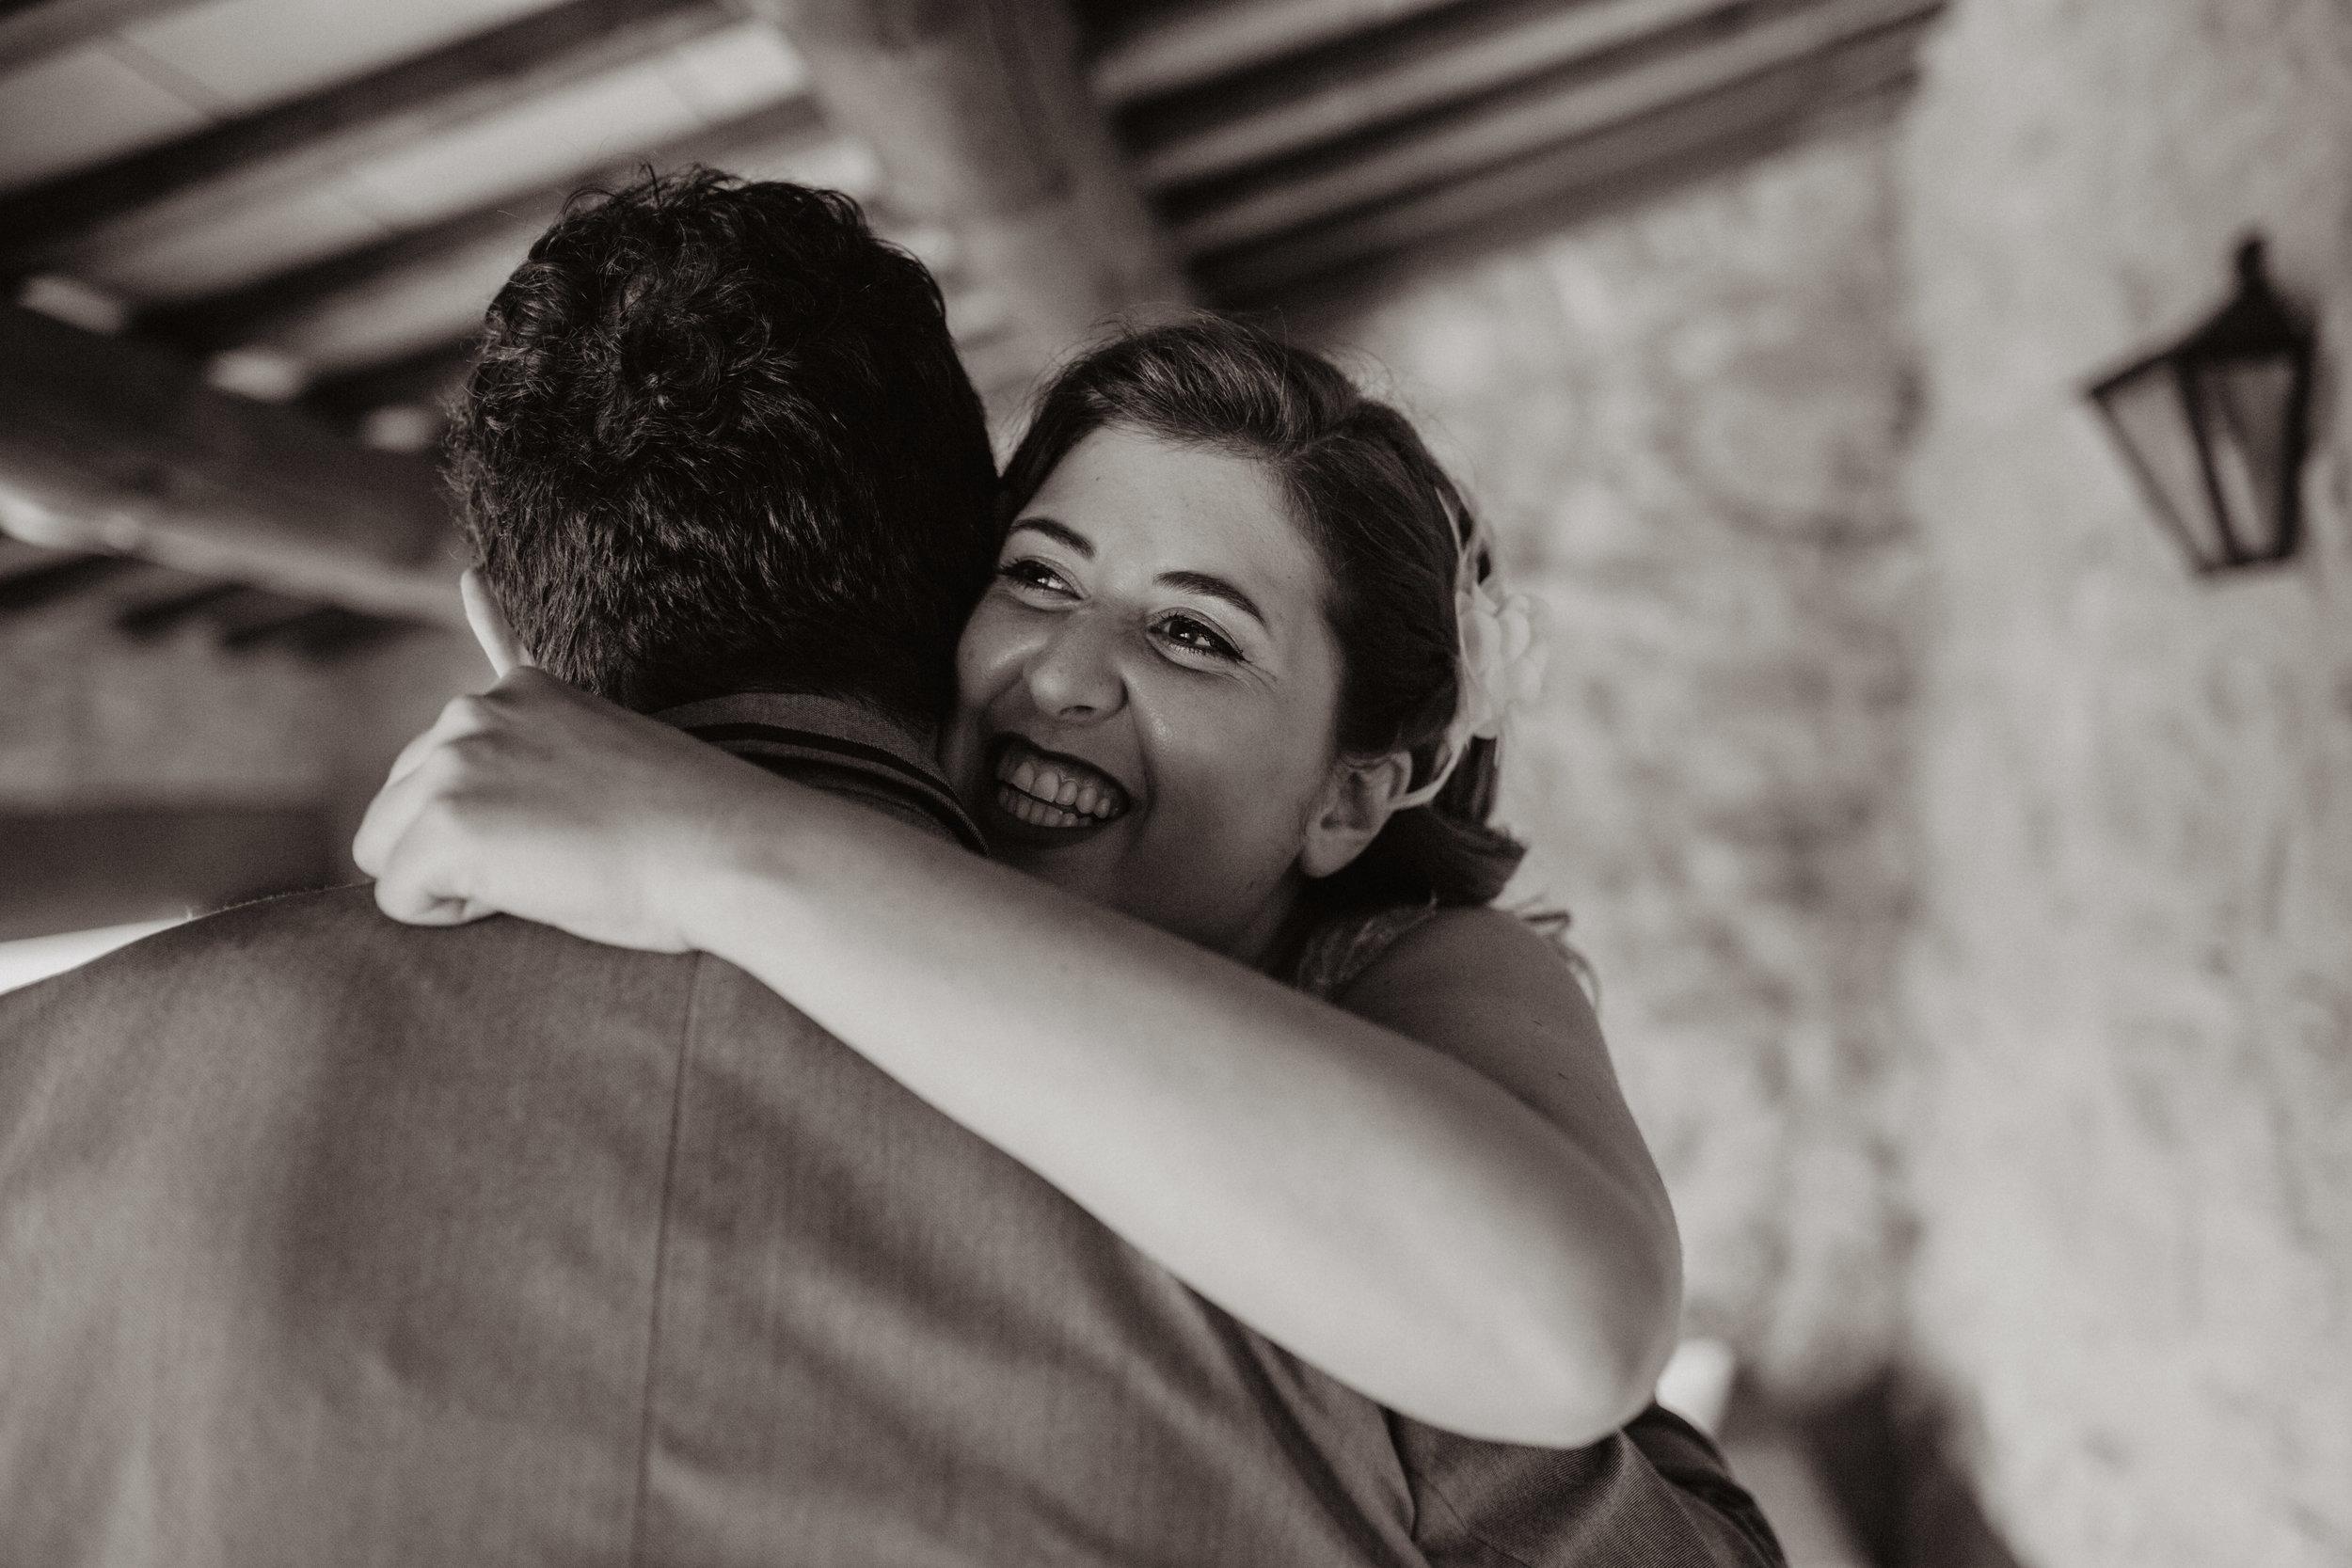 thenortherngirlphotography_photography_thenortherngirl_rebeccascabros_wedding_weddingphotography_masialagarrigadecastelladral_joaniemma_bodaenbarcelona_weddingphotographer_emmaijoan-144.jpg